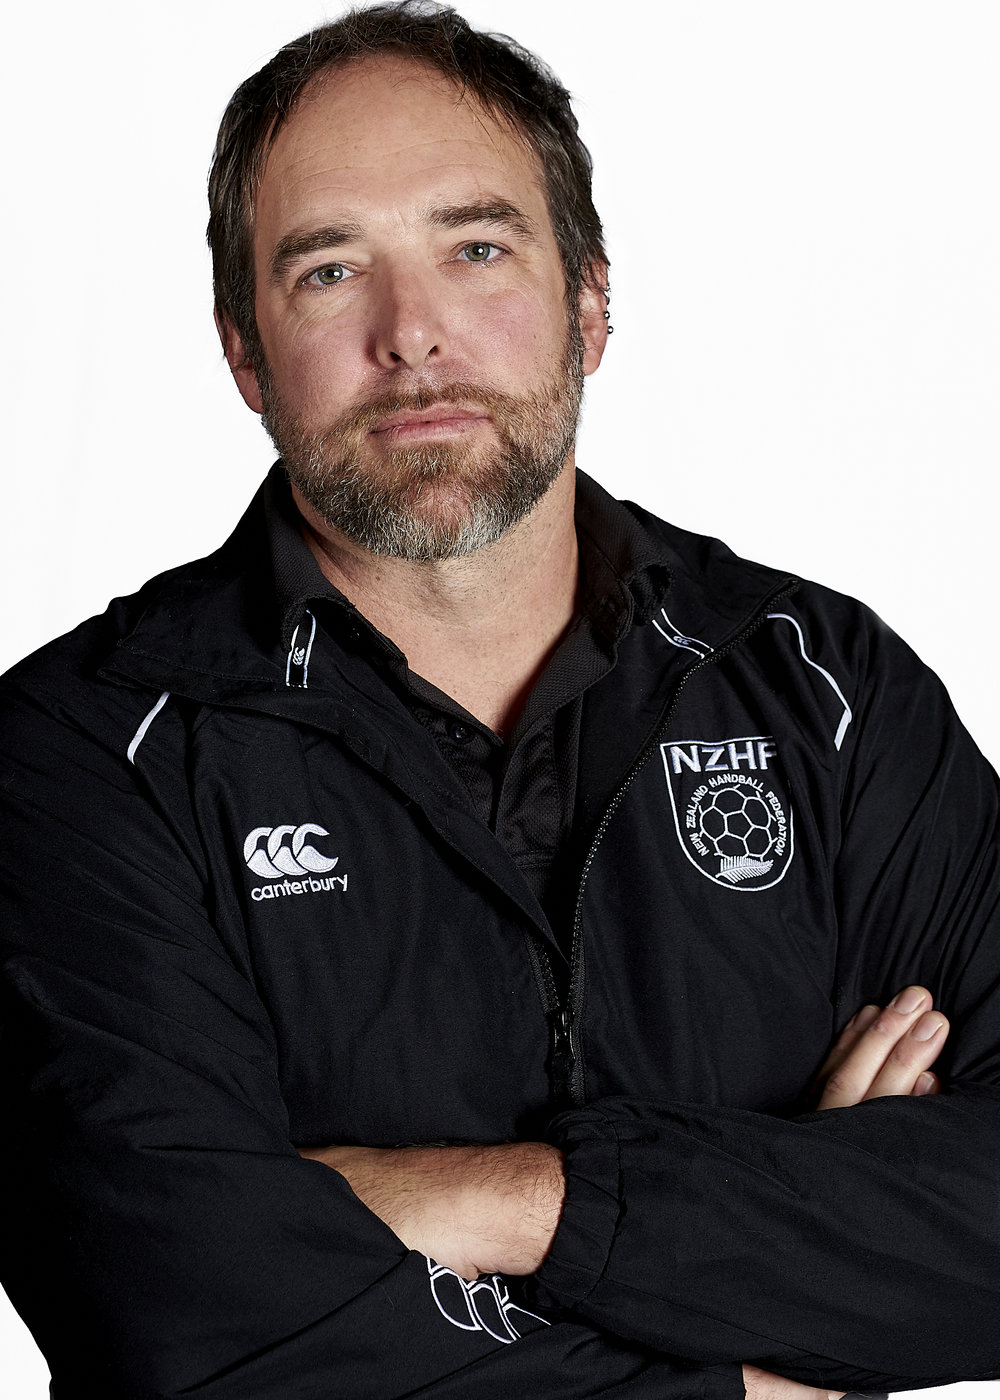 Benjamin Birkenhake (Coach), Canterbury